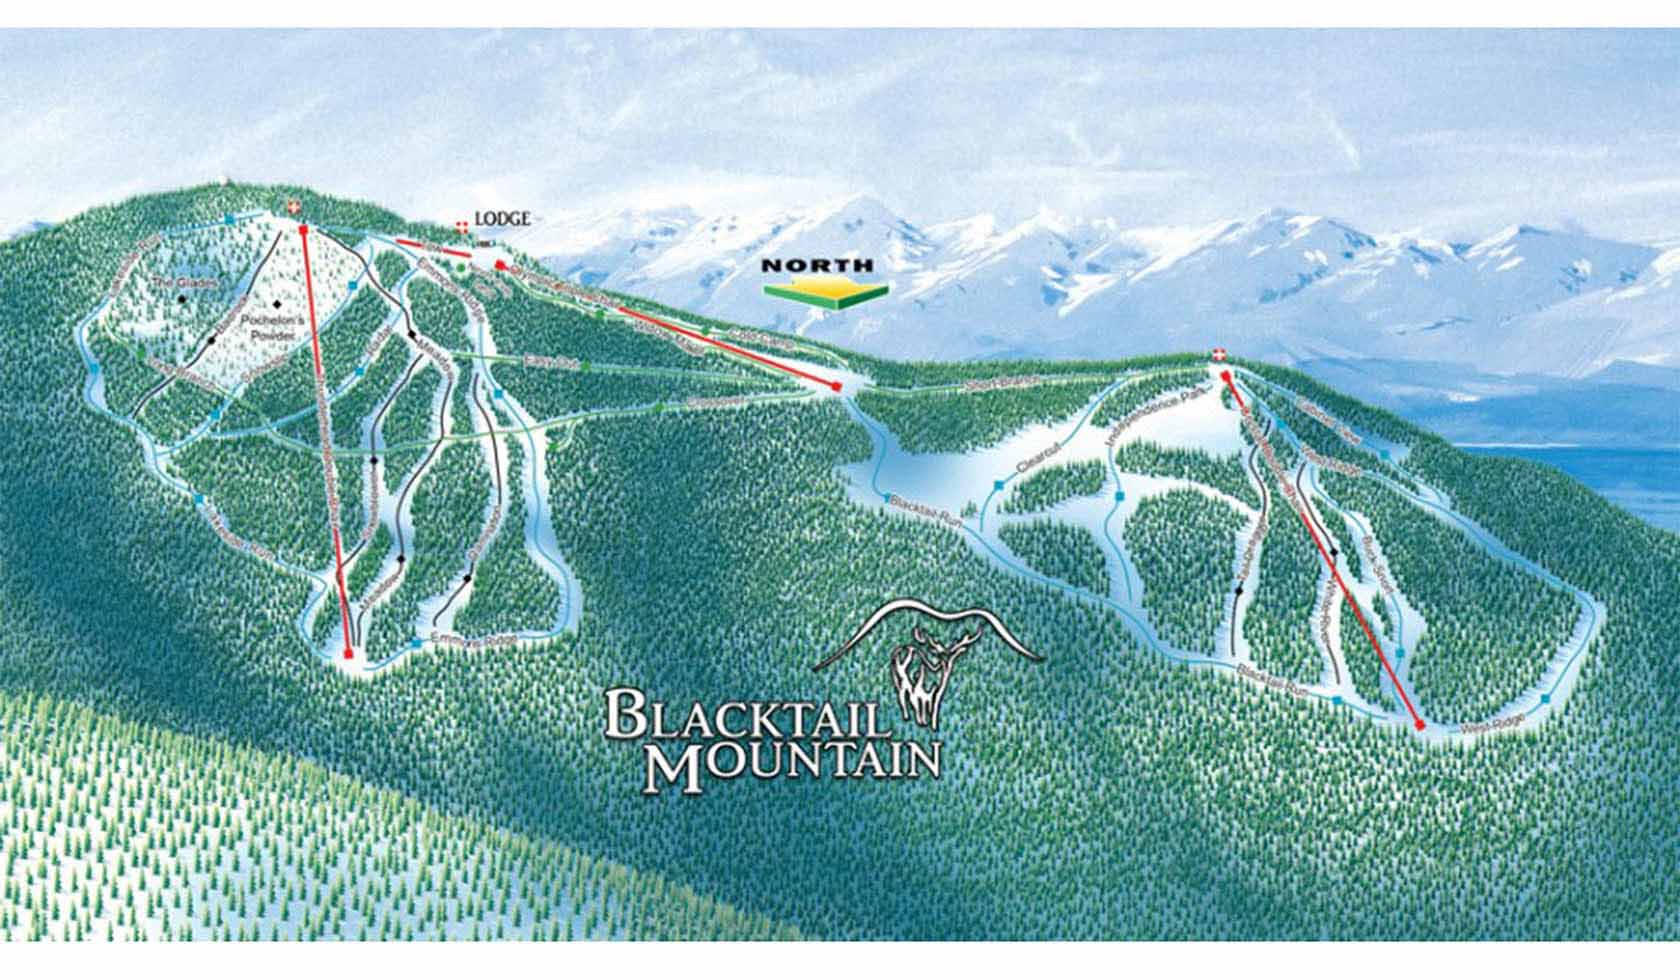 Blacktail Mountain Ski Area - Us map of ski resorts